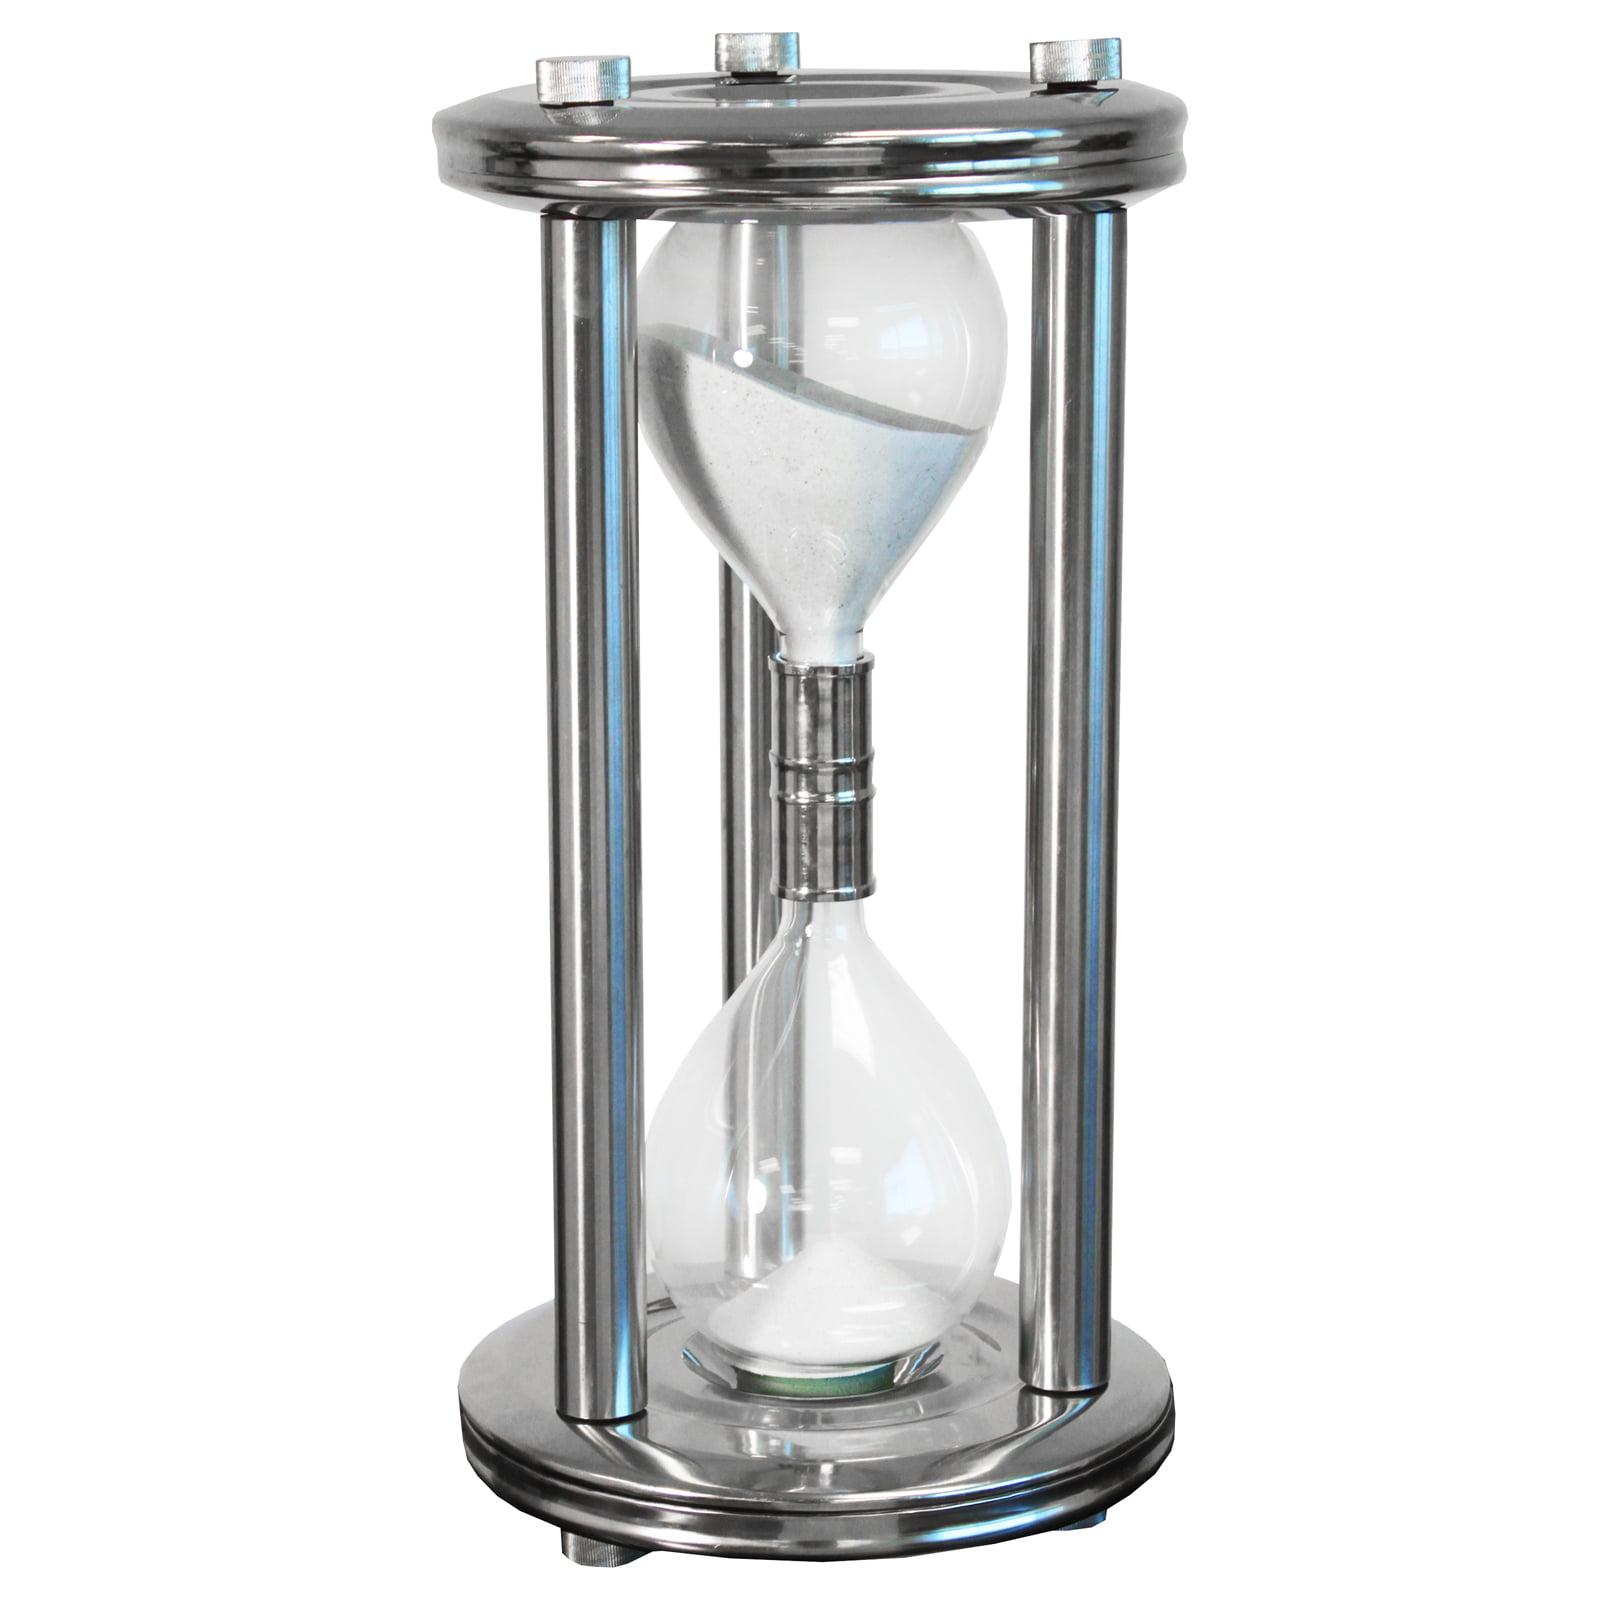 EC World Imports Urban Designs Desktop 10-Minute Hourglass by EC World Imports